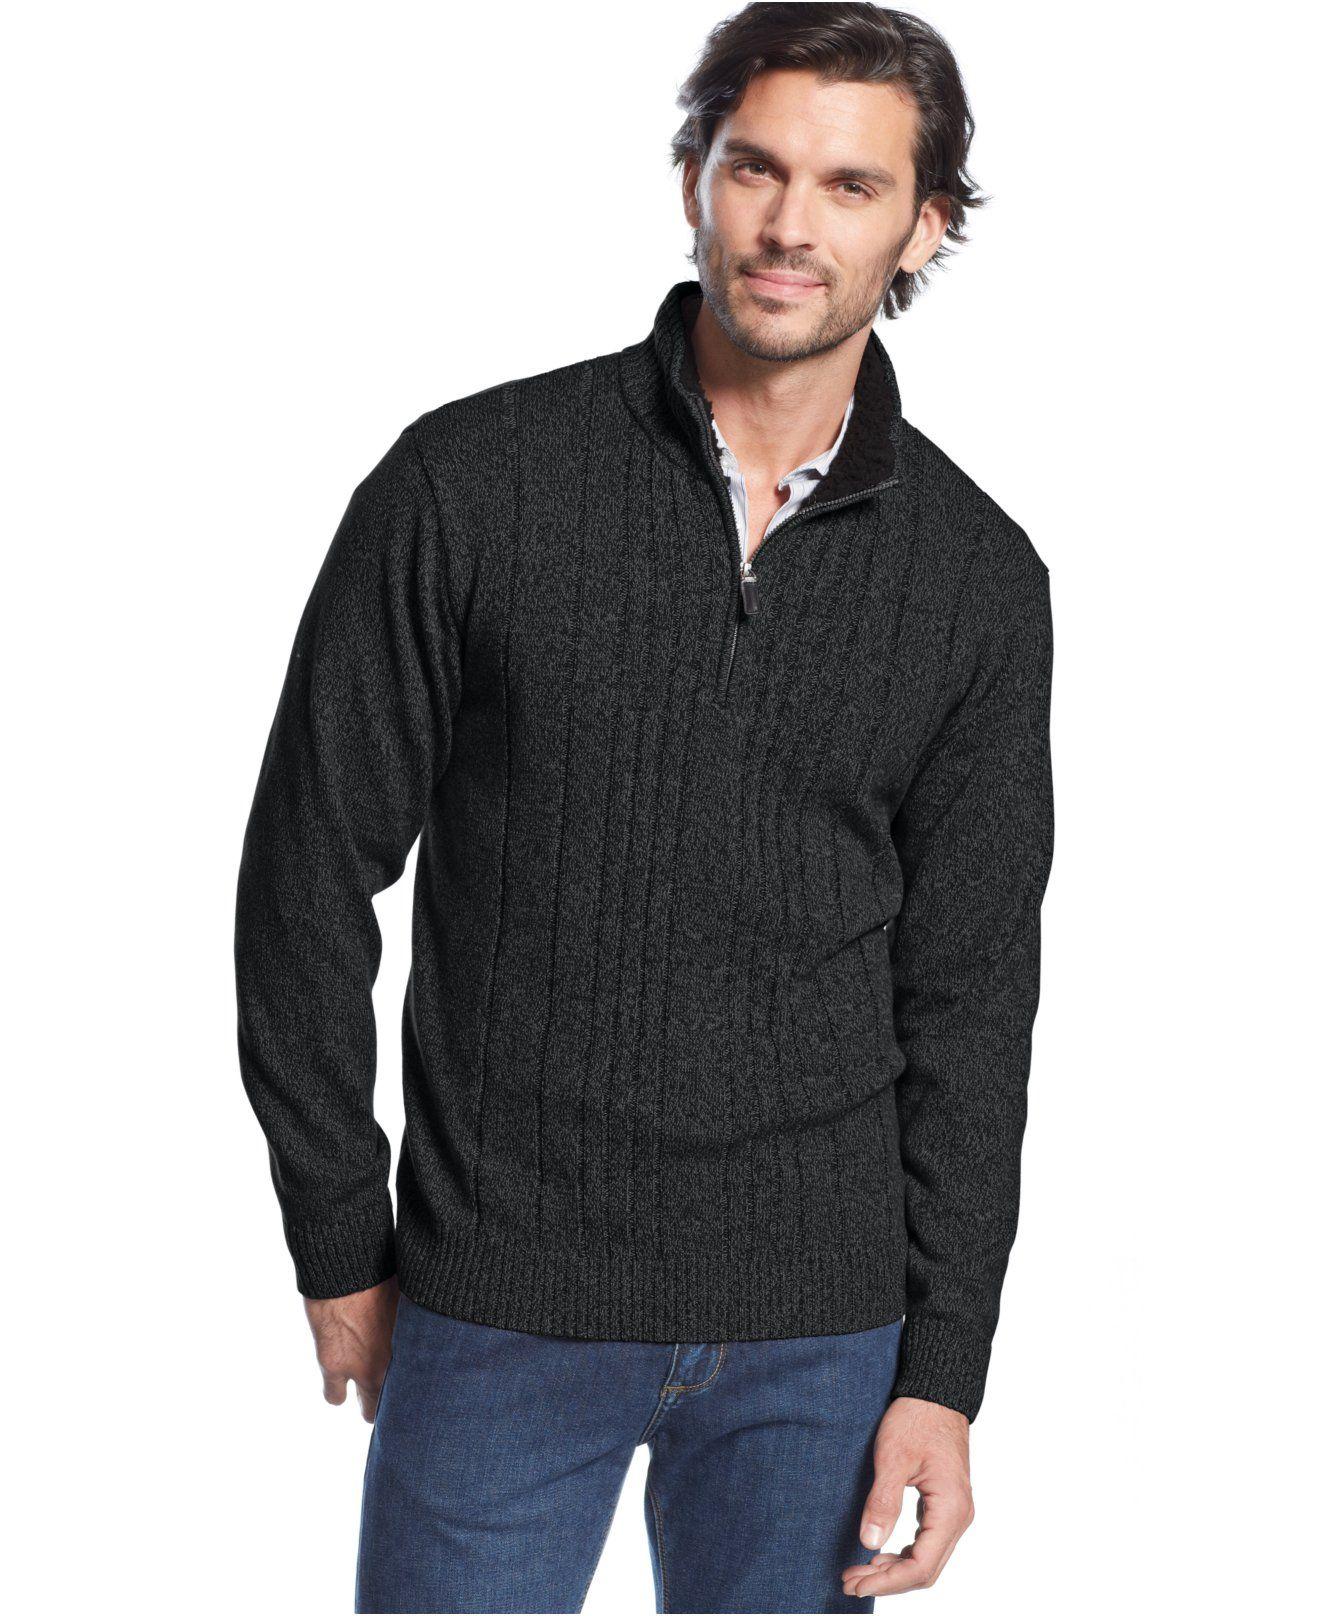 852426d96 Tricots St. Raphael Faux-Shearling-Collar Quarter-Zip Sweater in Jet Marl  Size Medium  31.99 sale